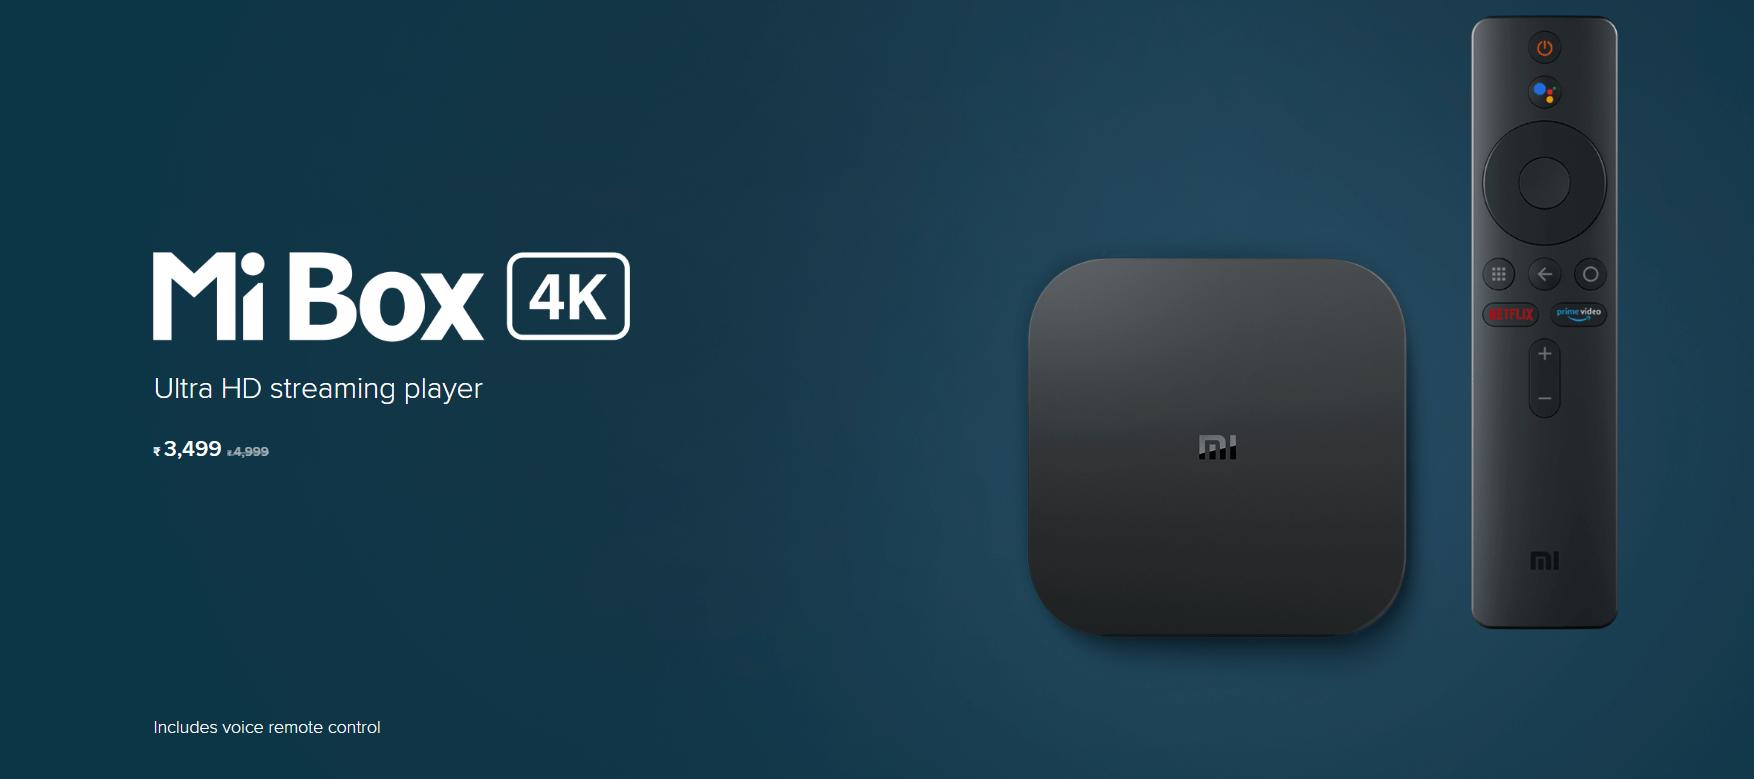 Xiaomi has launched its new Mi Box 4K